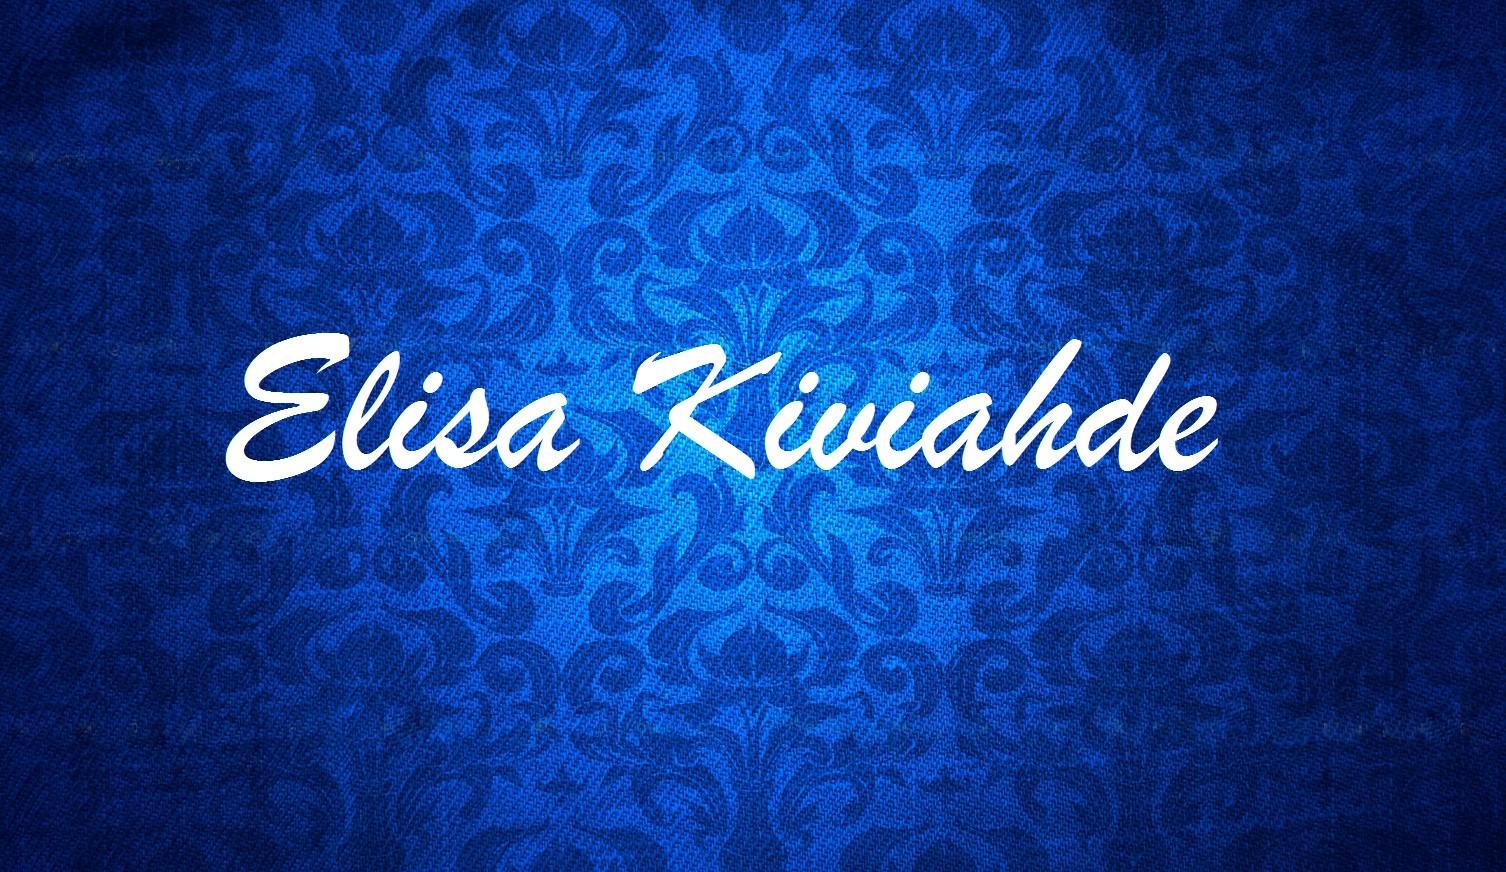 Elisa Kiviahde